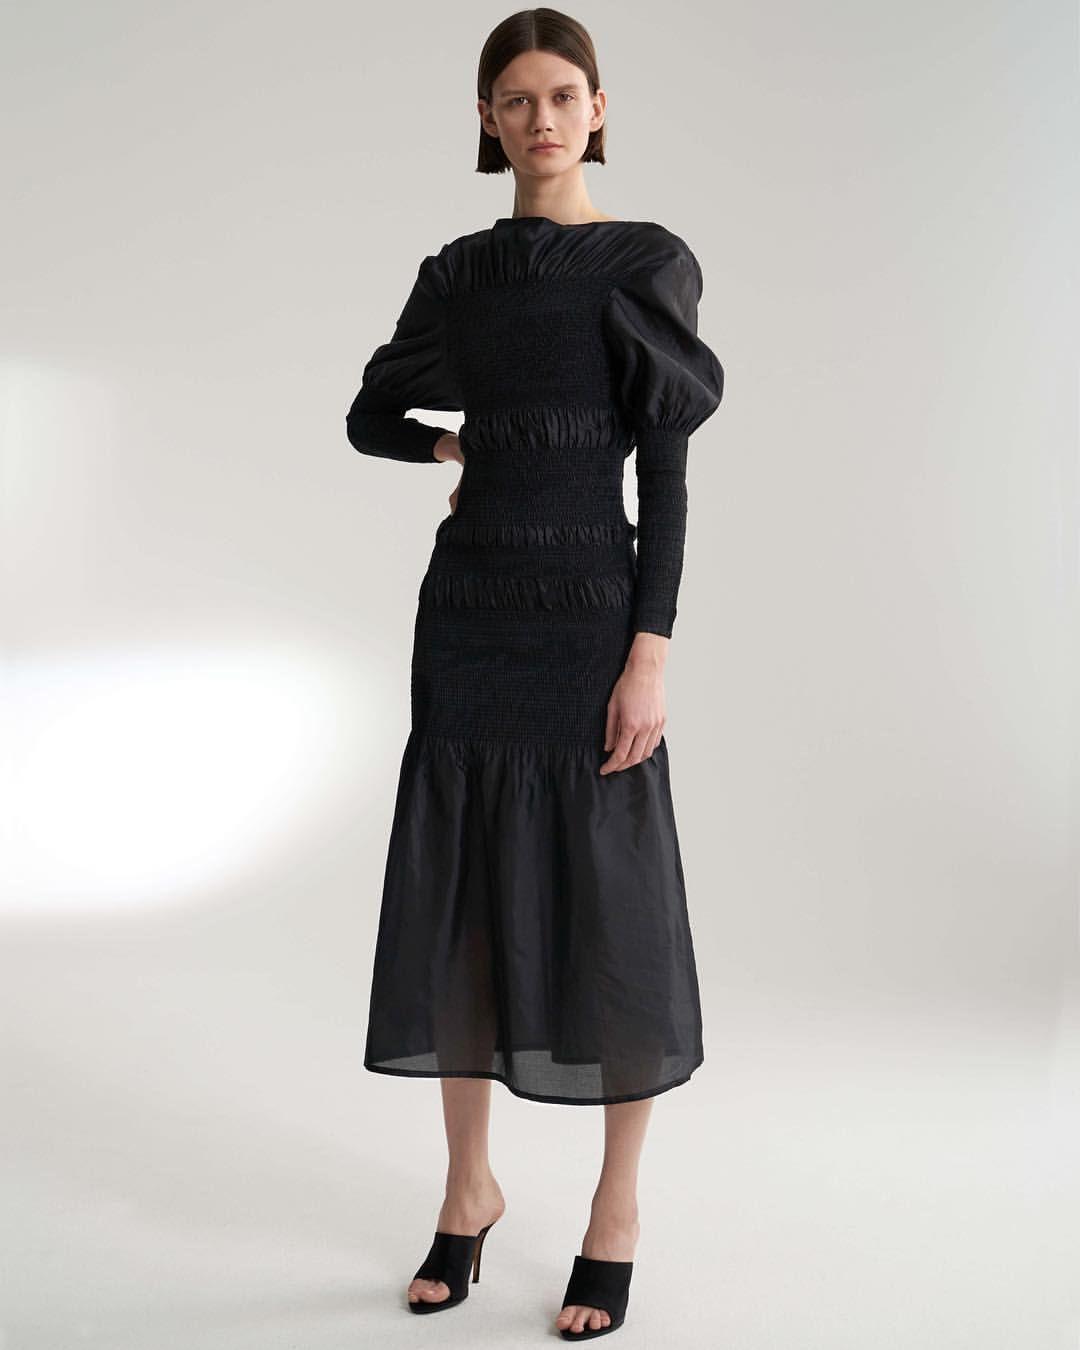 ca2d79b68c5 Cold Shoulder Dress, High Neck Dress, Korean Fashion, Street Style, Chic,